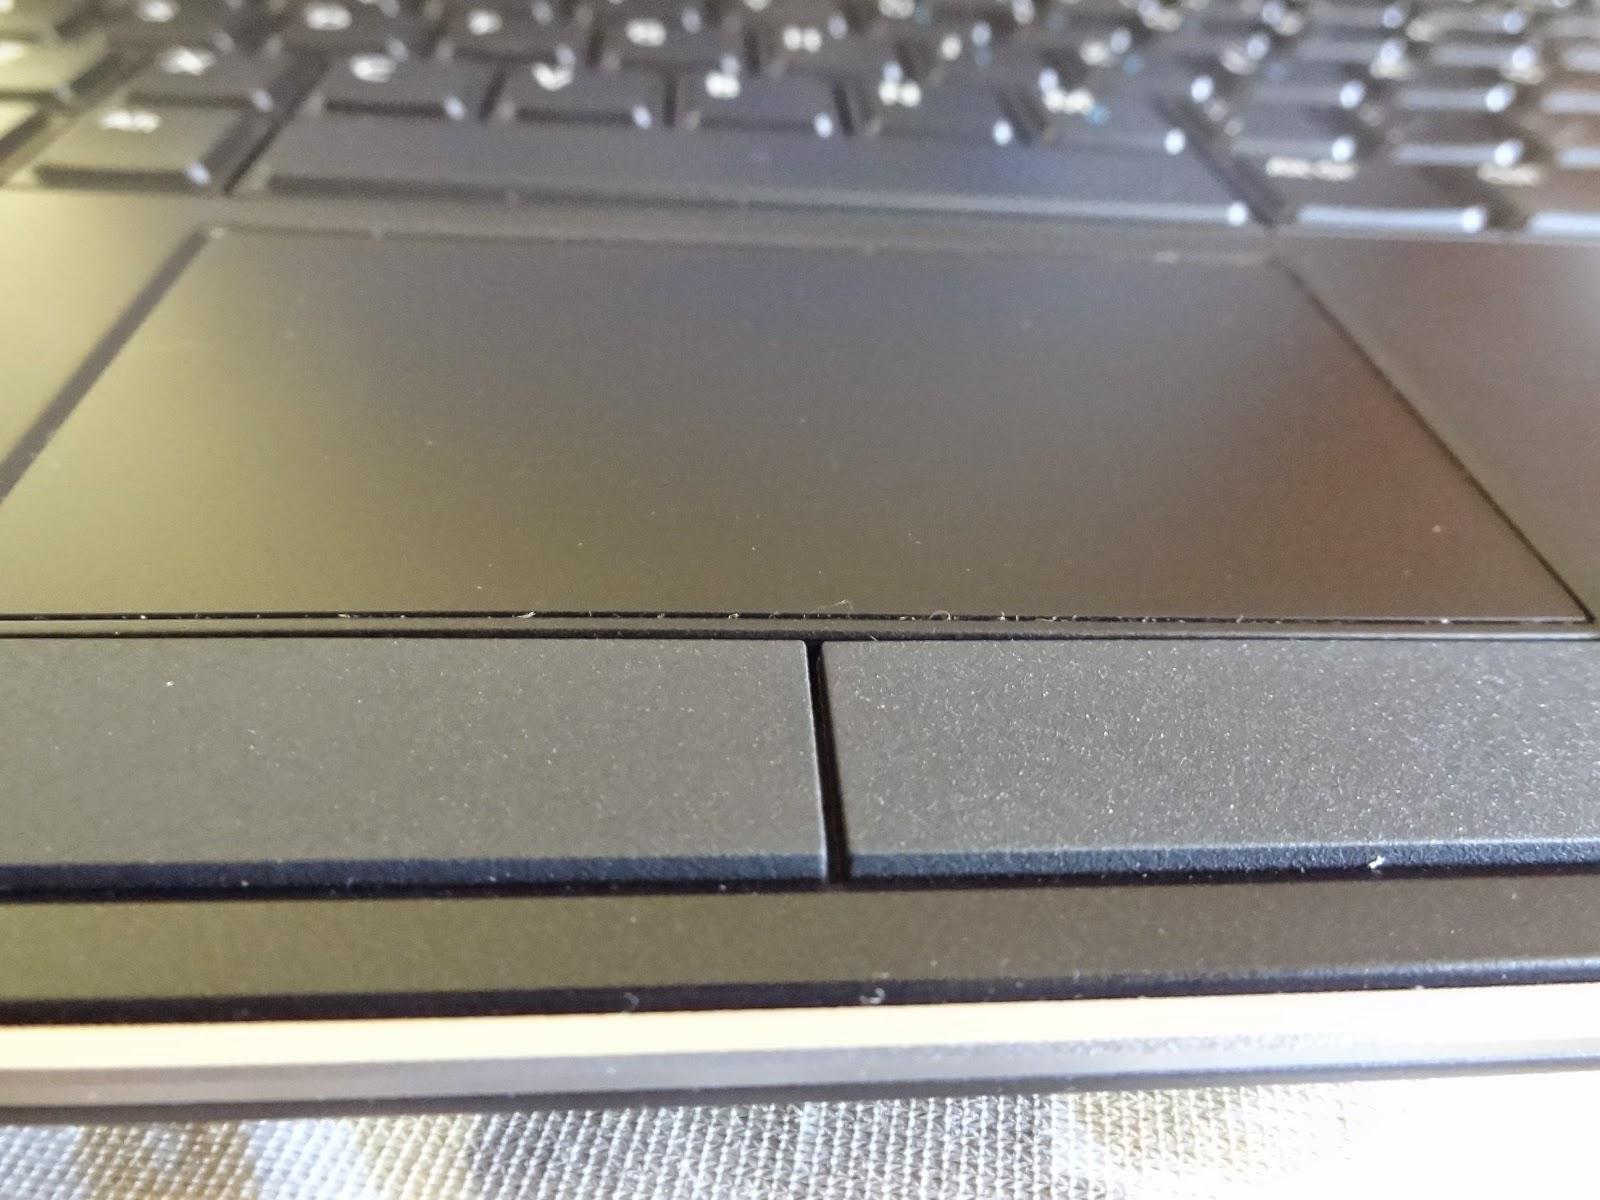 E7240 touchpad keys